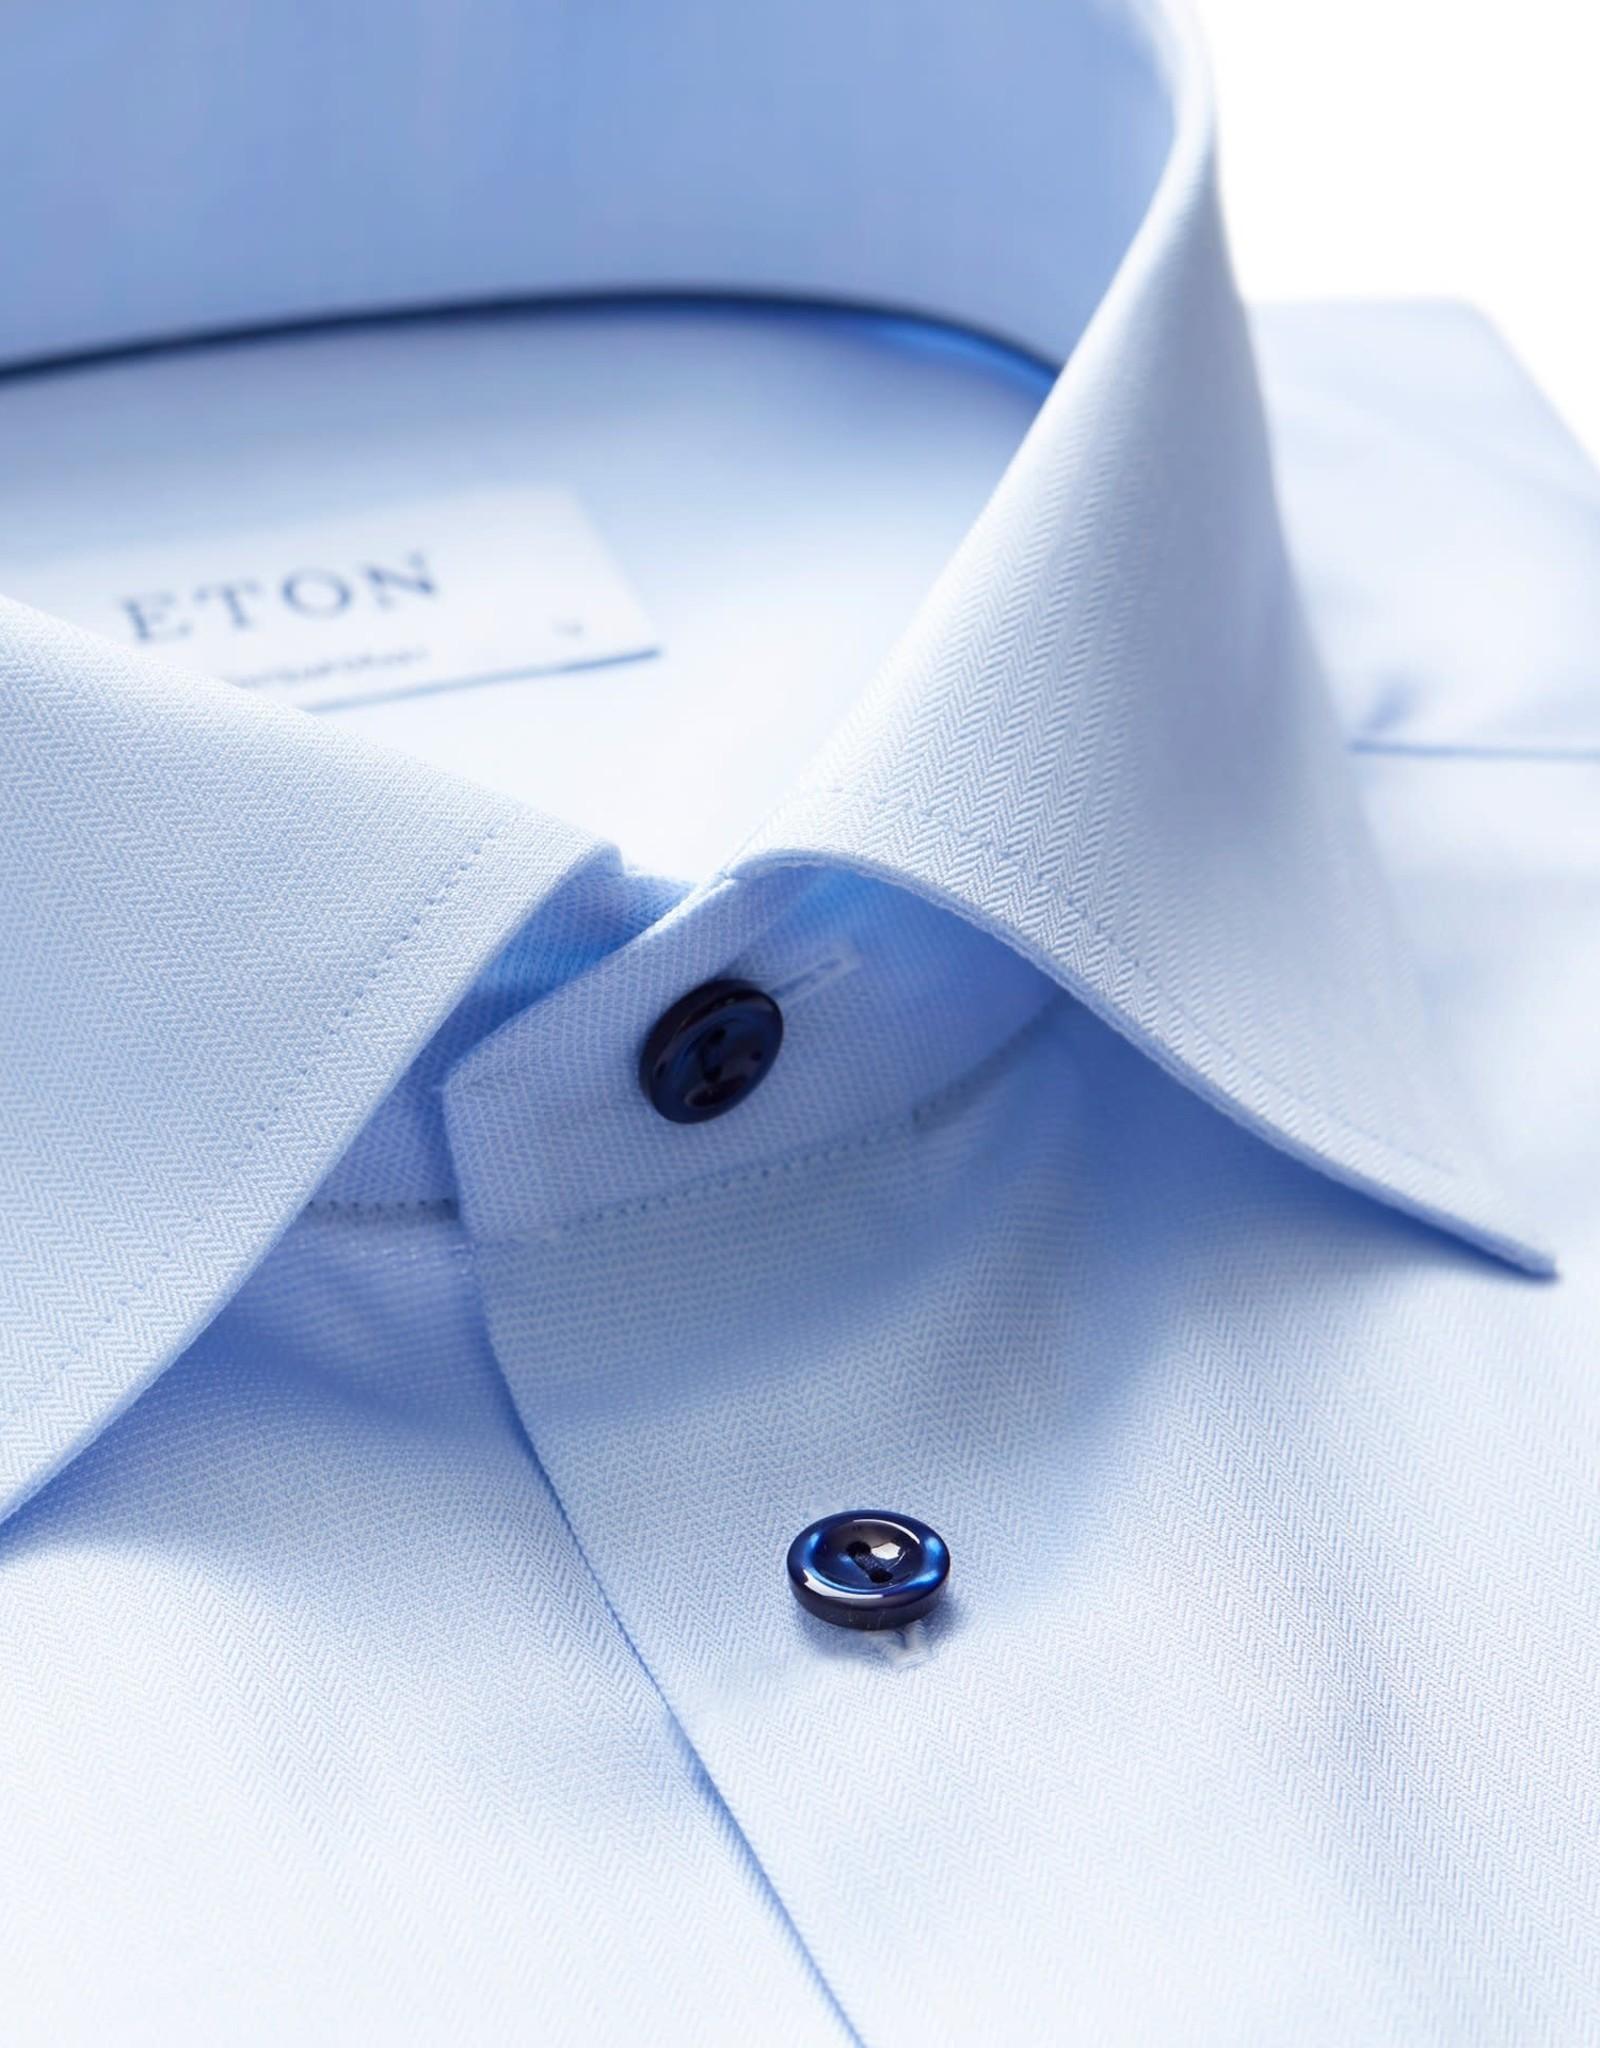 Eton Eton hemd blauw contemporary 3295-79339/21